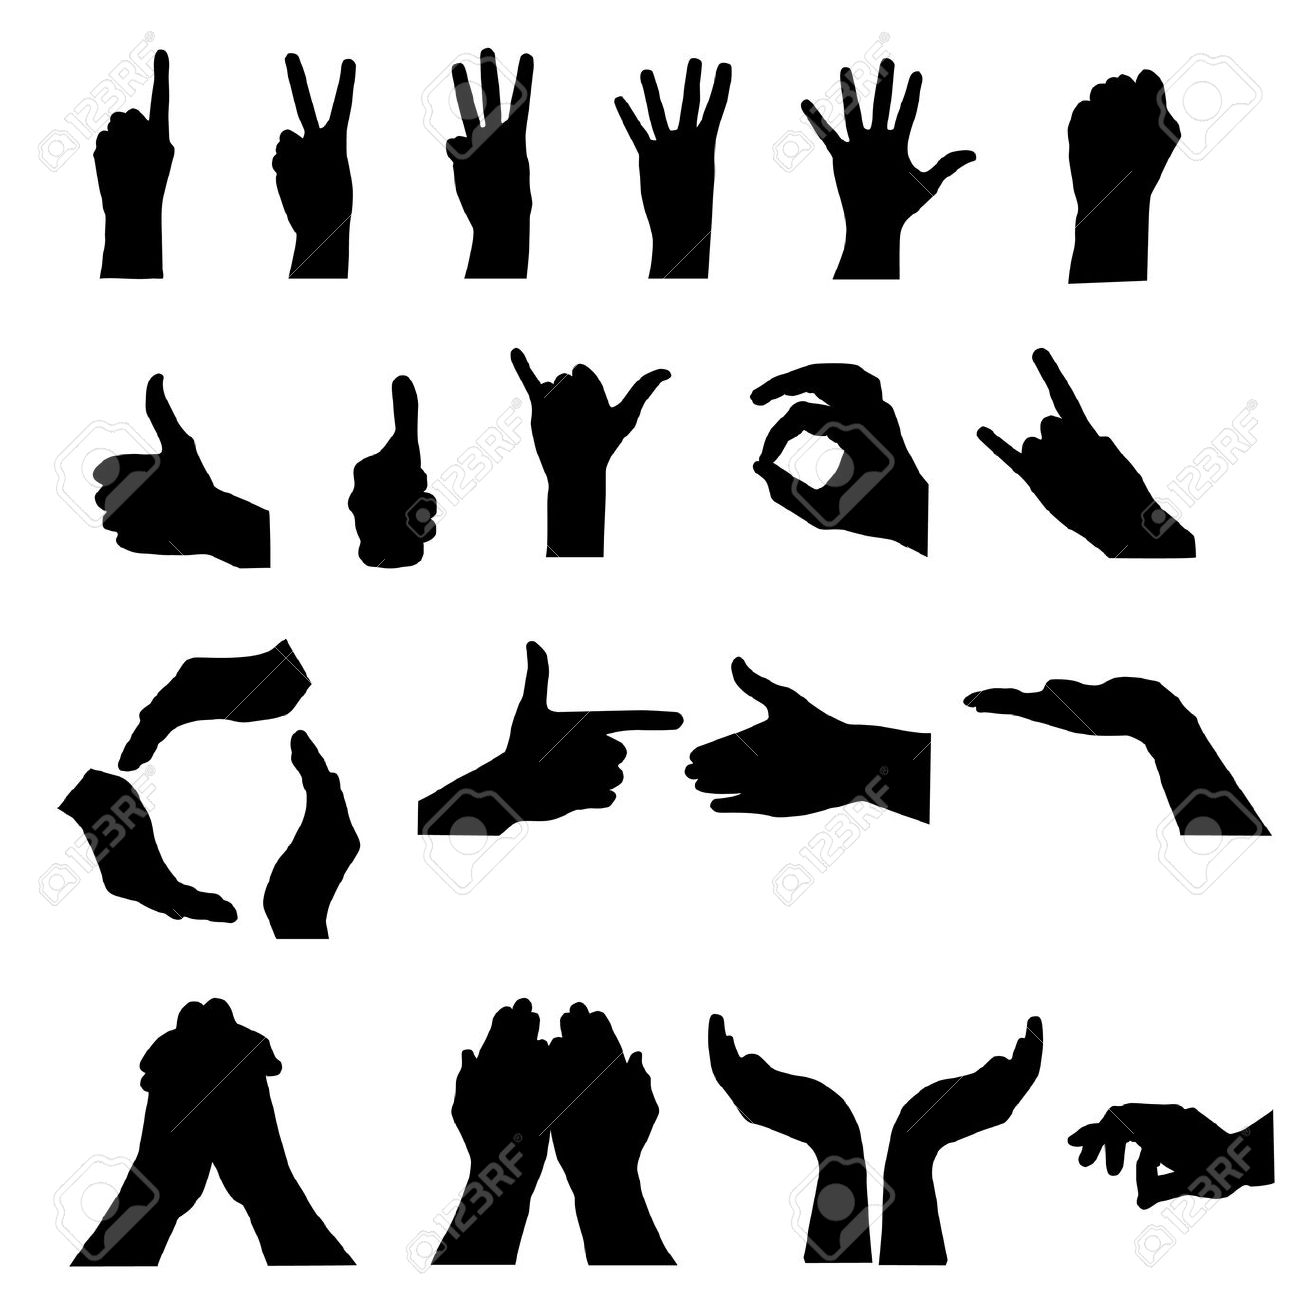 Hand Gesture clipart logo Illustration  white Stock 10946578